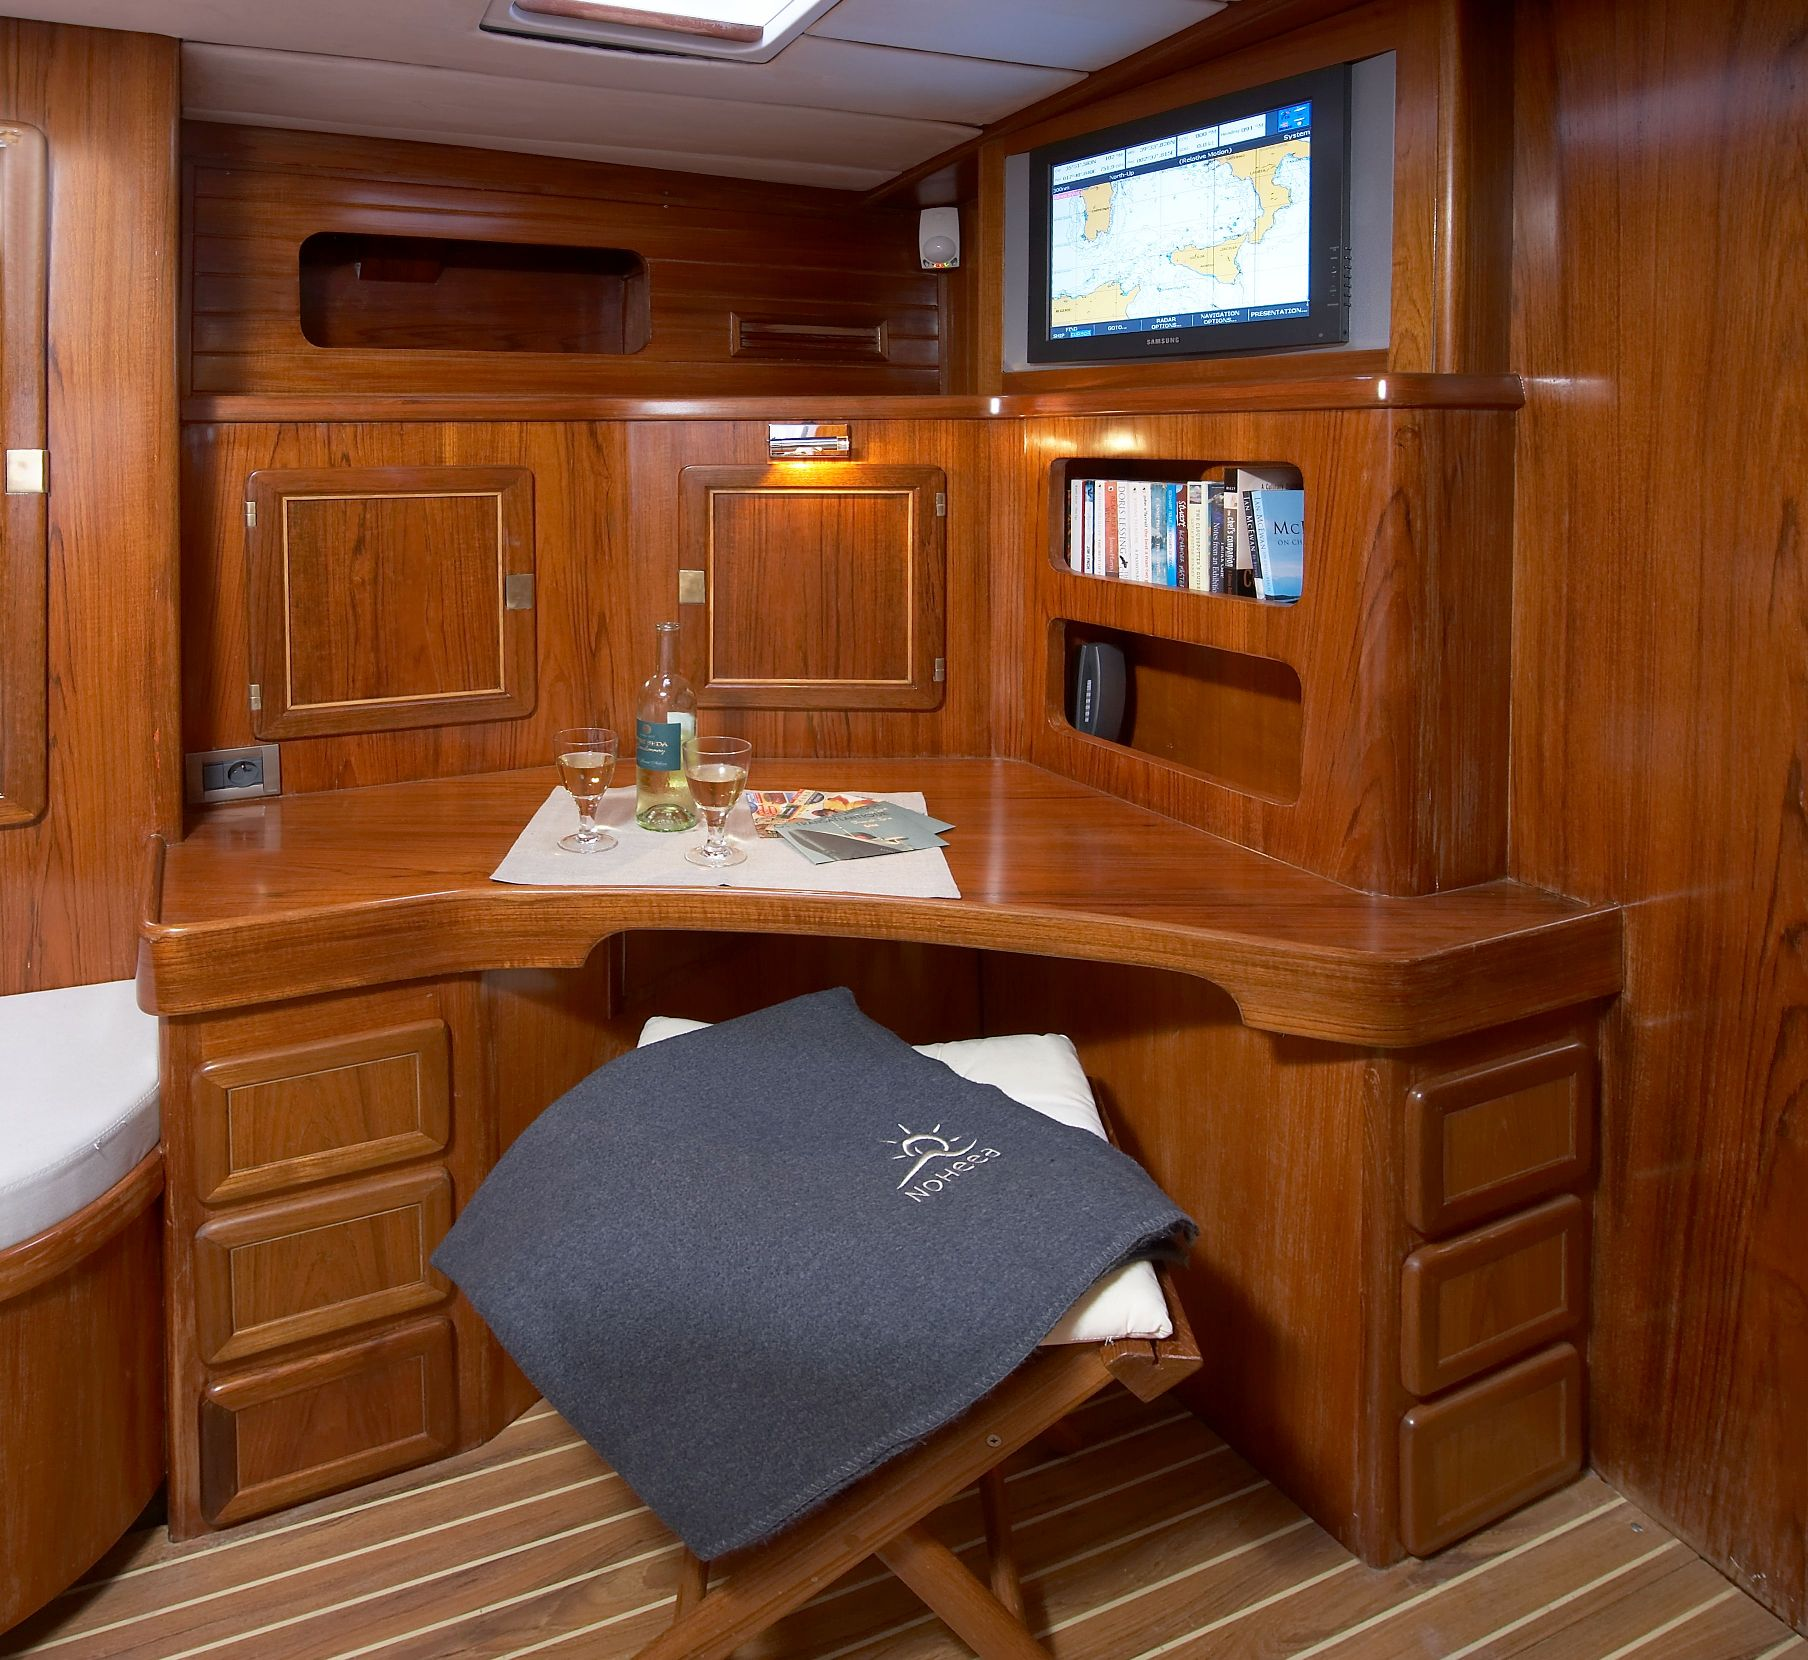 NOHEEA - The Study Desk in her Master Cabin